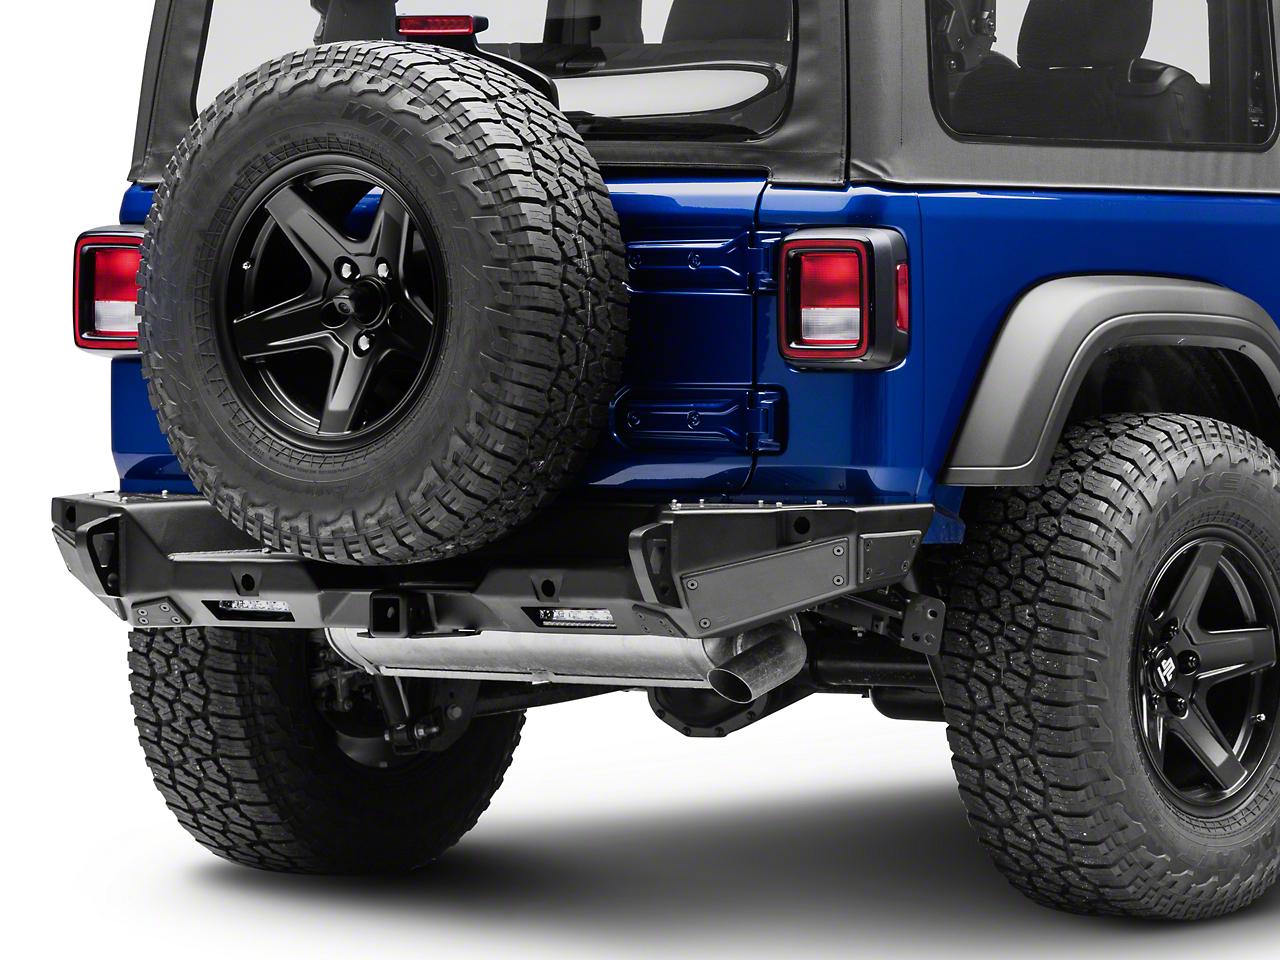 Smittybilt XRC Gen2 Rear Bumper (2018 Jeep Wrangler JL)